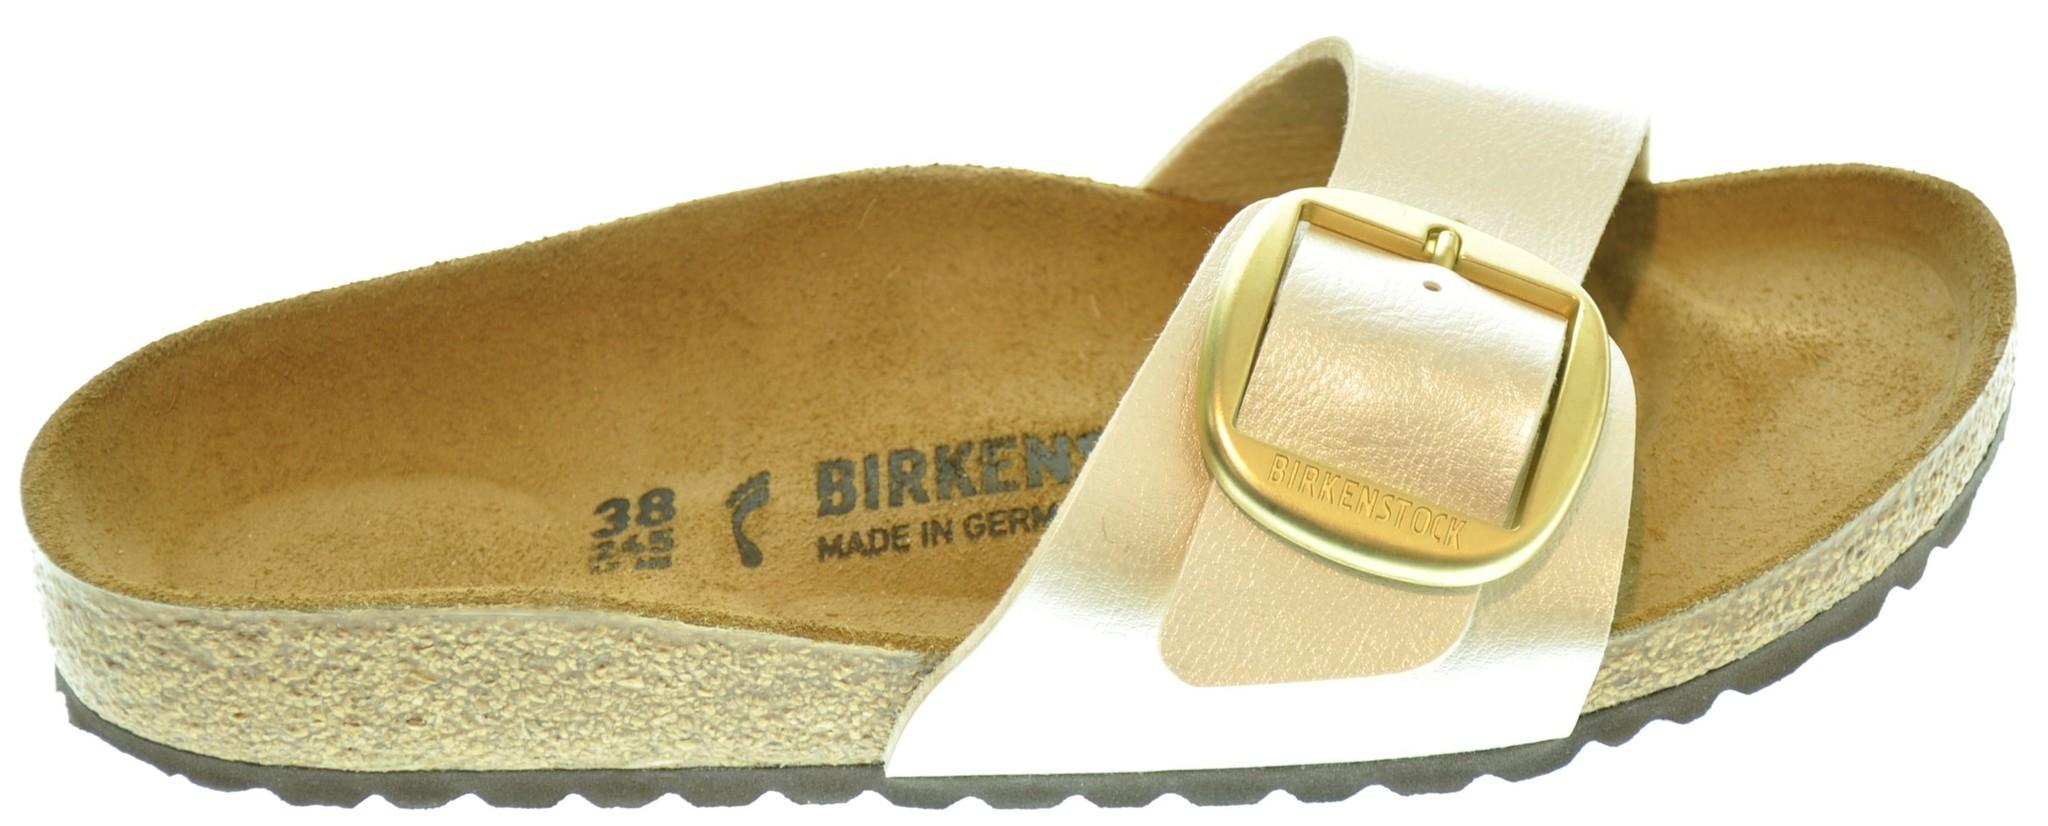 Birkenstock Birkenstock Slipper (36 t/m 41) 201BIR09